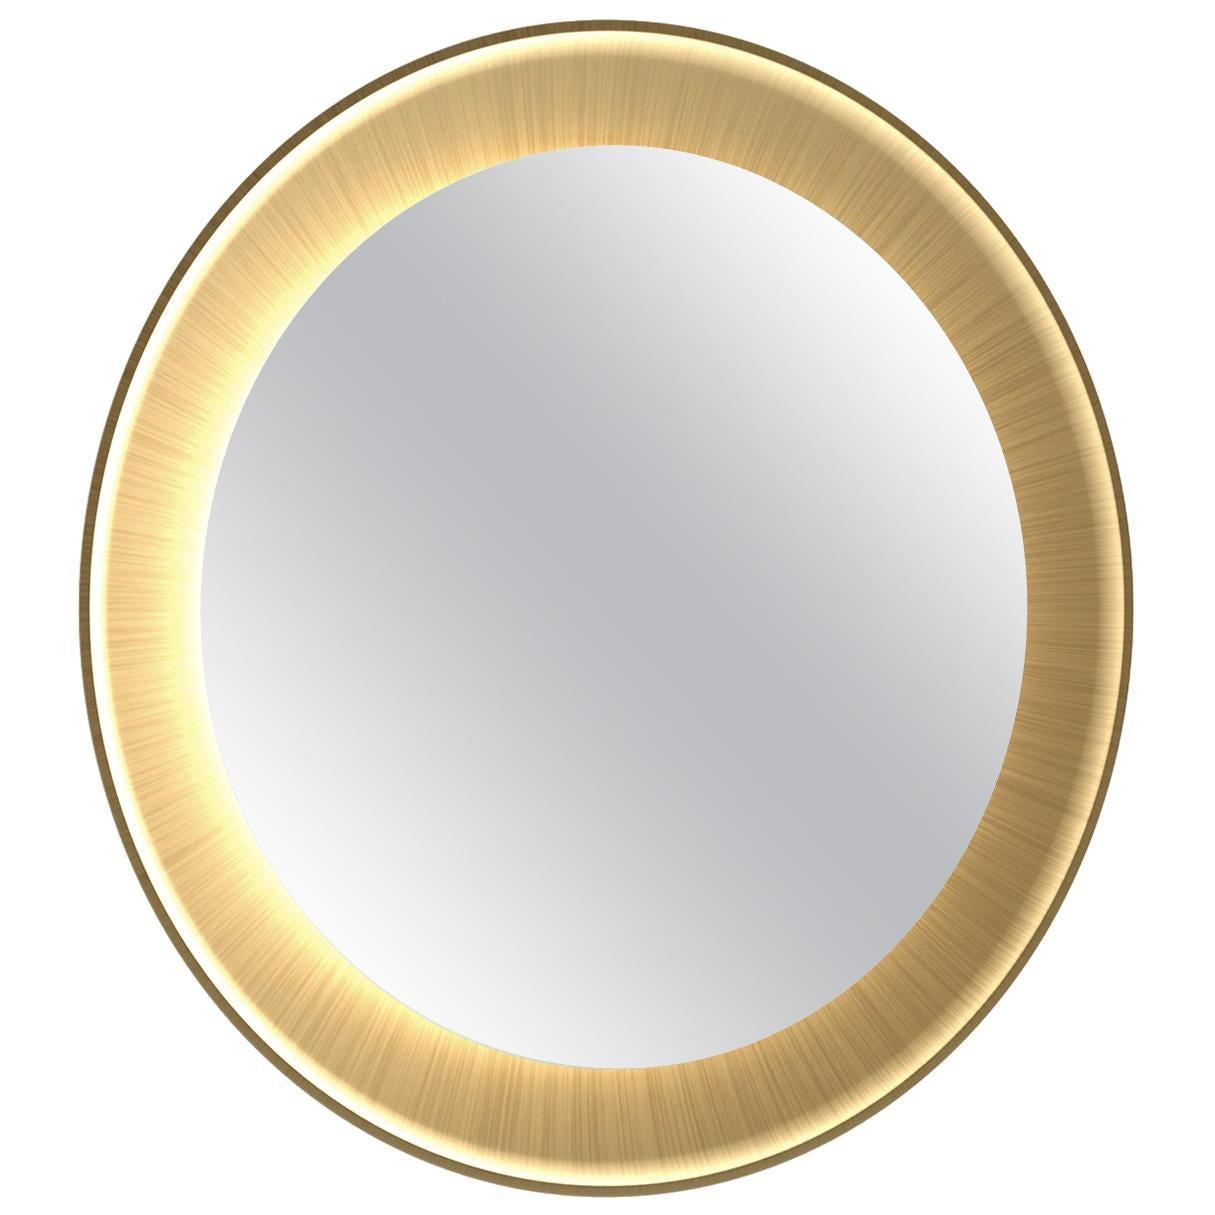 Melrose Wall Mirror by Giannella Ventura